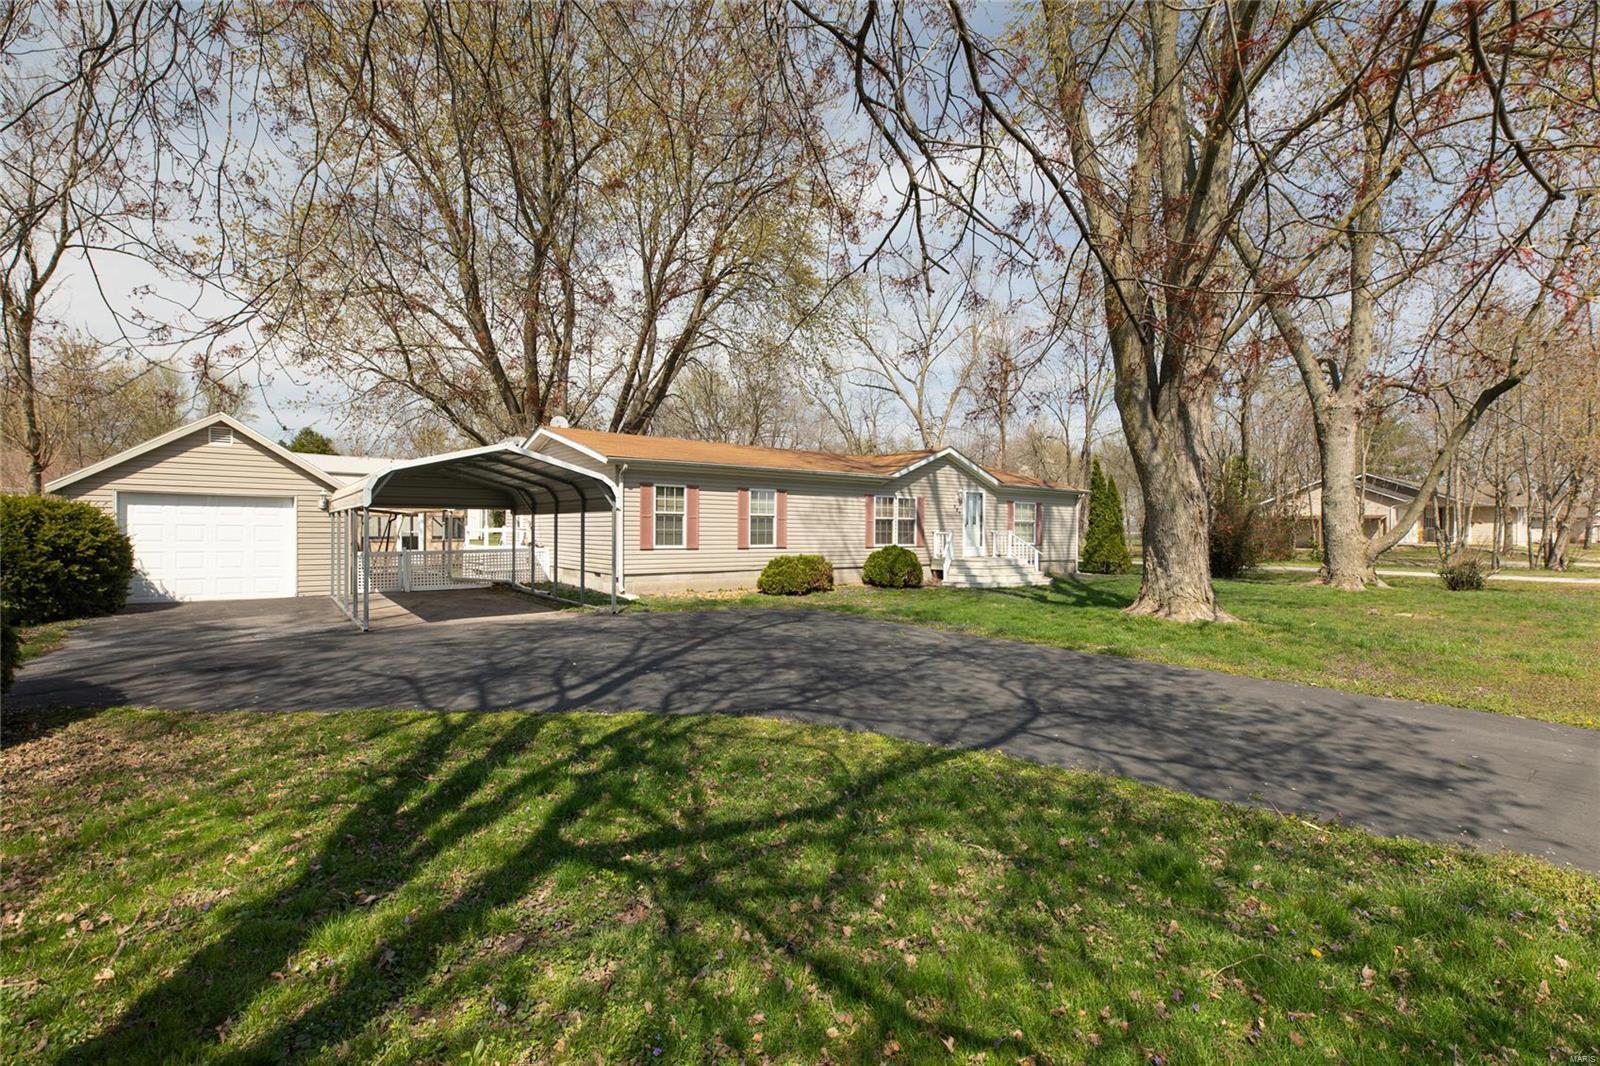 321 E Alton Property Photo - Marine, IL real estate listing